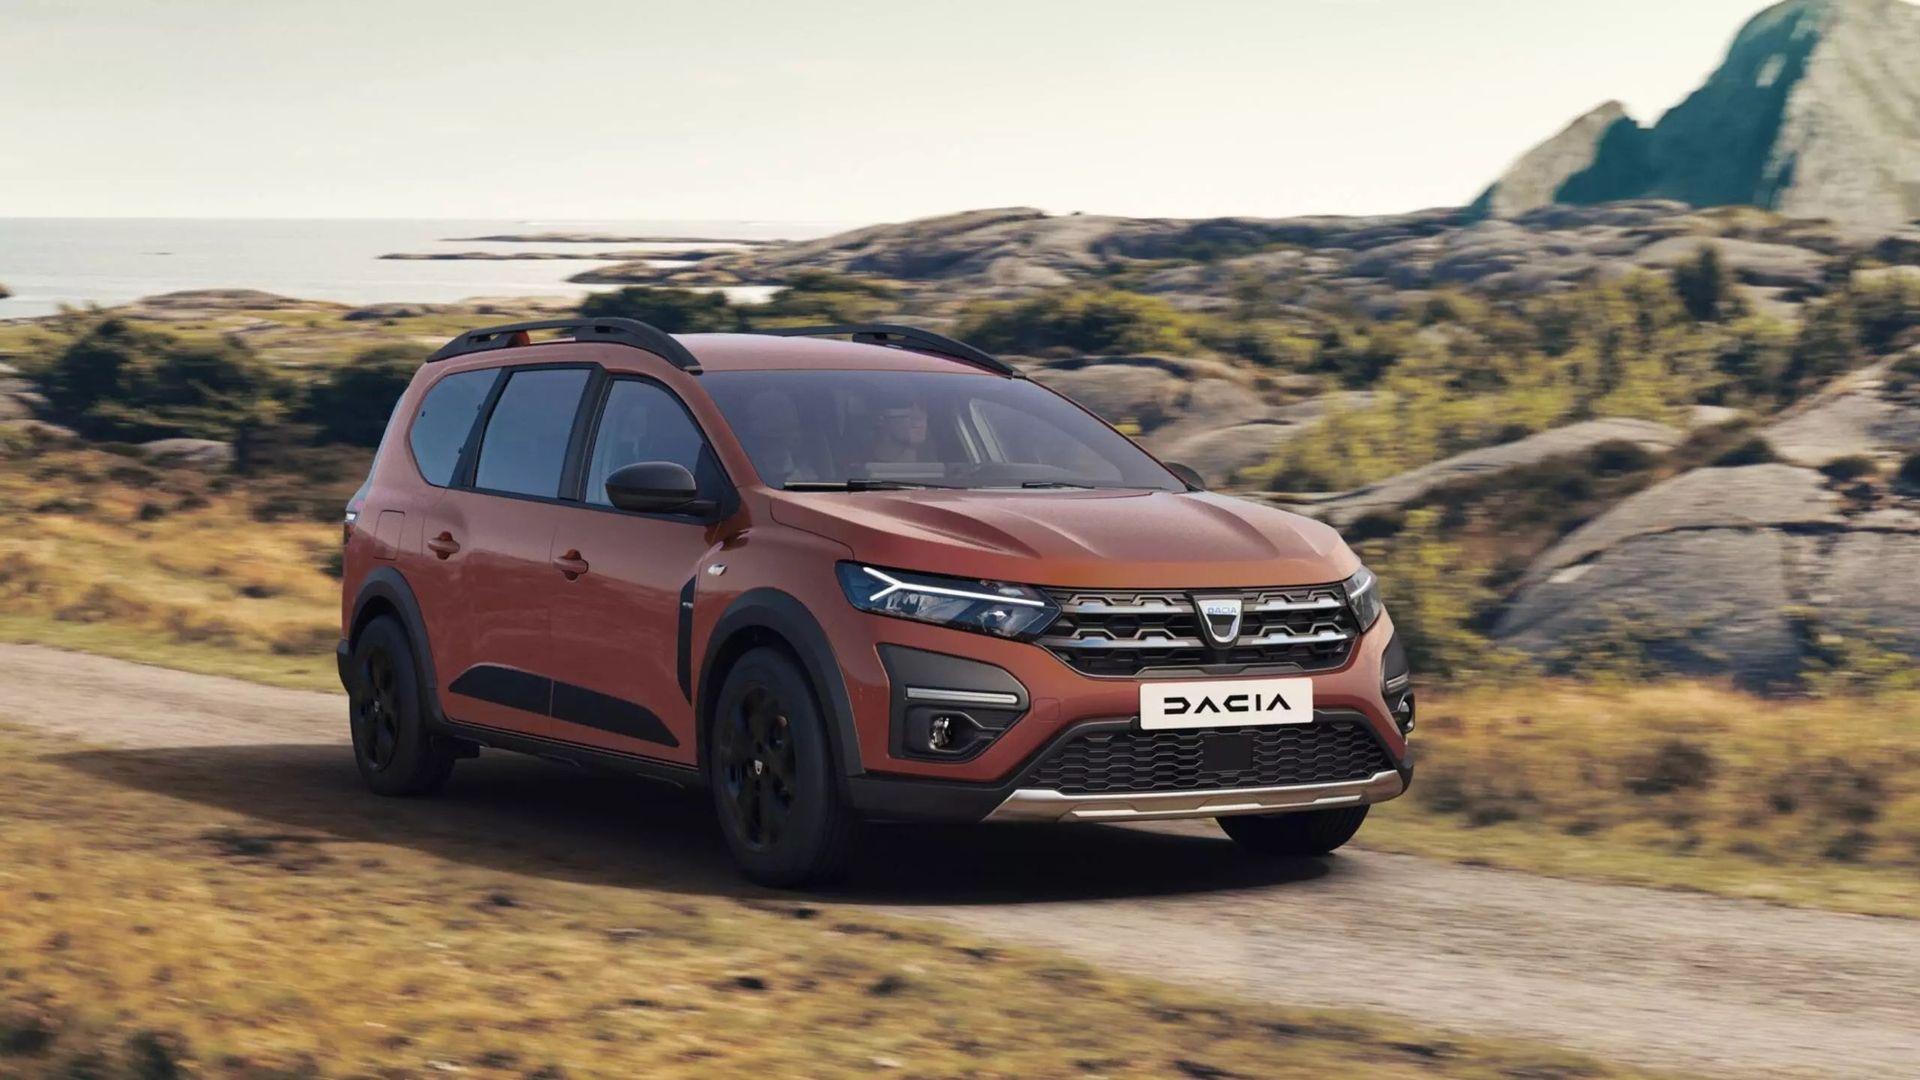 Dacia presenterar sjusitsiga Jogger